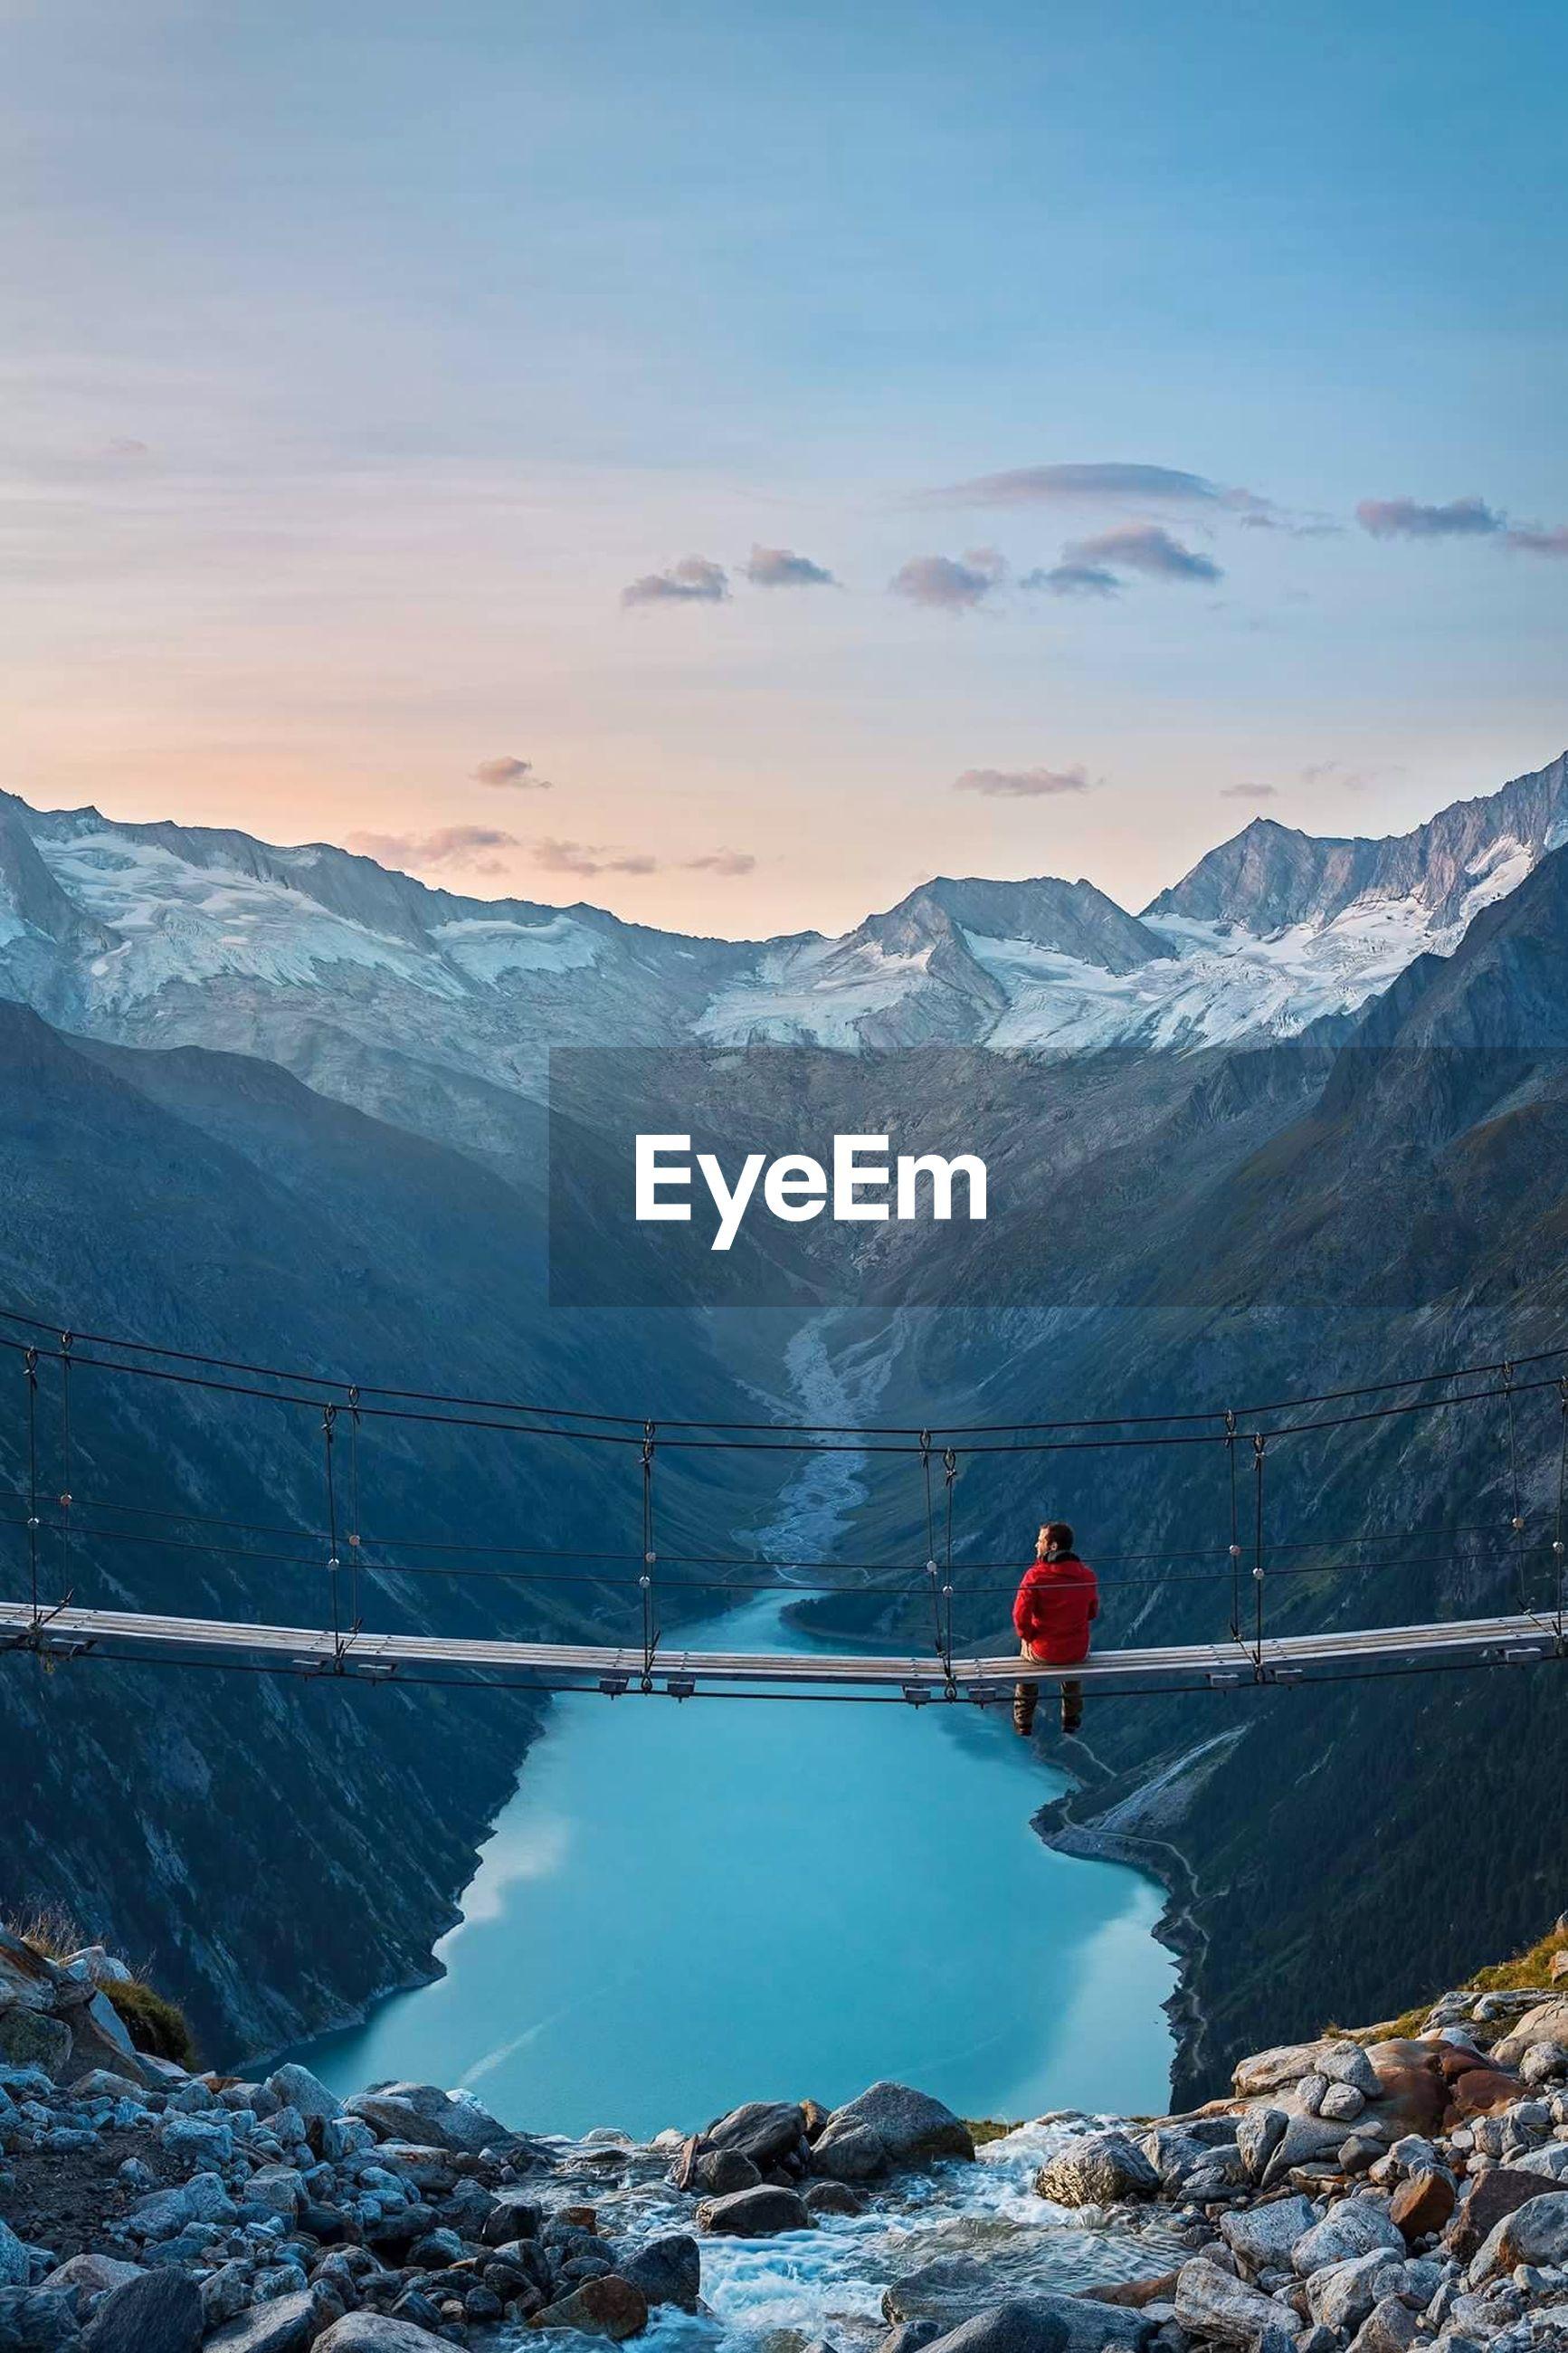 Man sitting on footbridge over lake against mountains